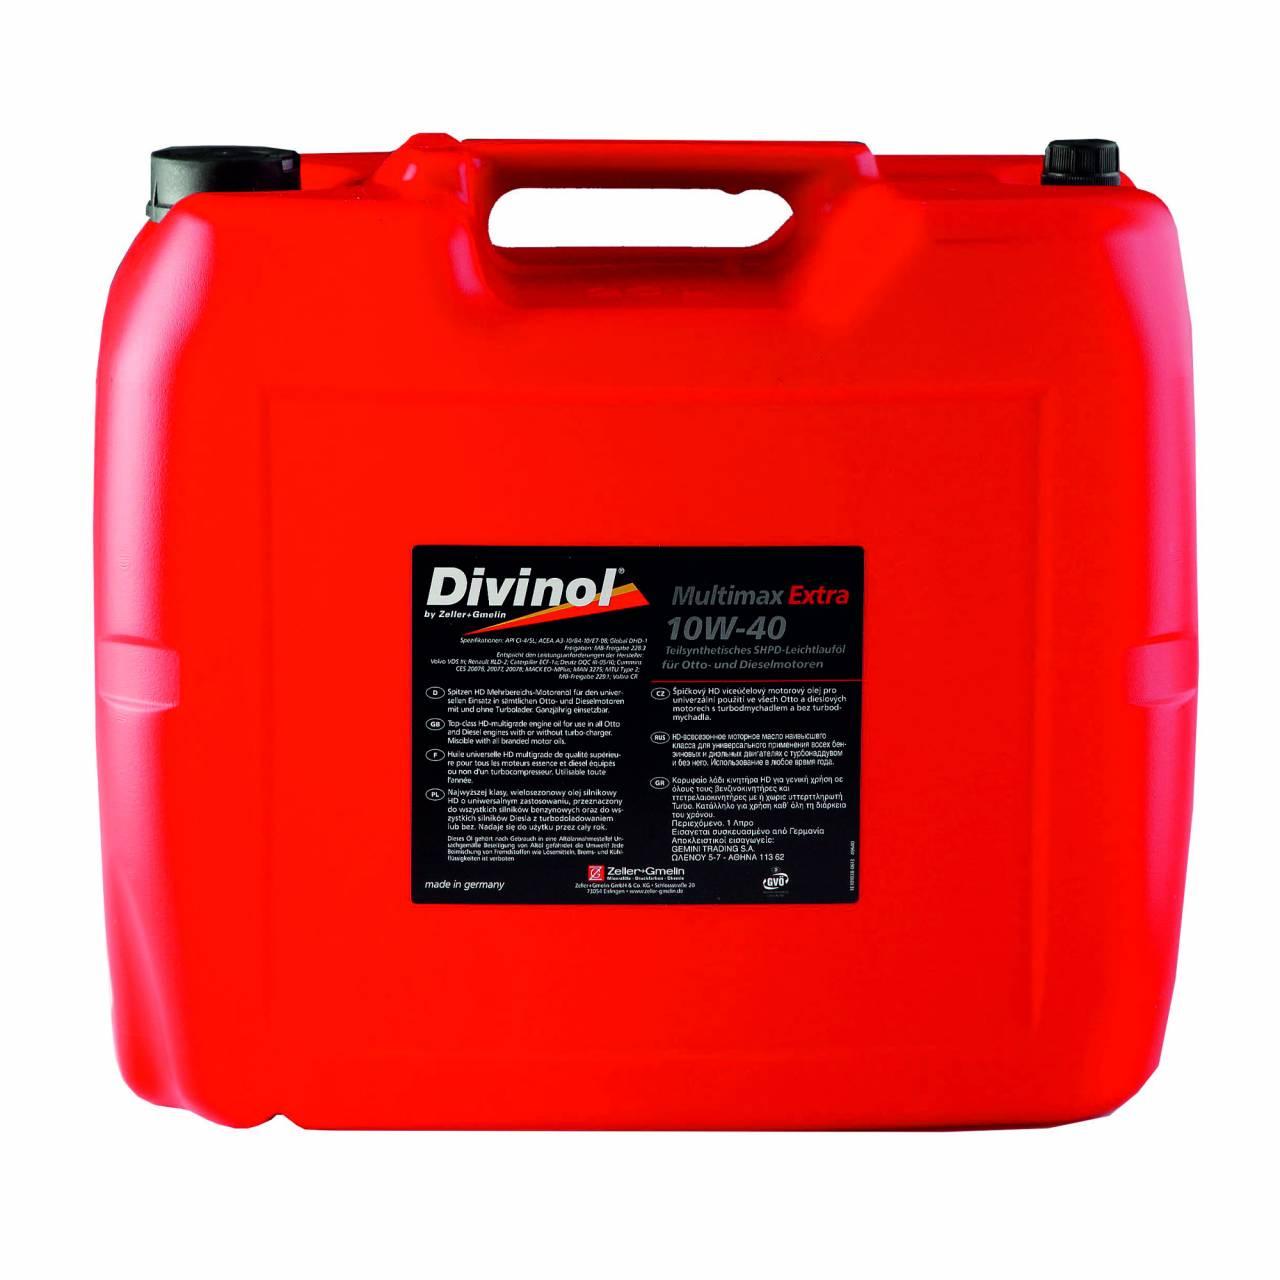 Motorenöl 'Divinol' Multimax Extra 10W-10 / 20,0 Liter Kanister